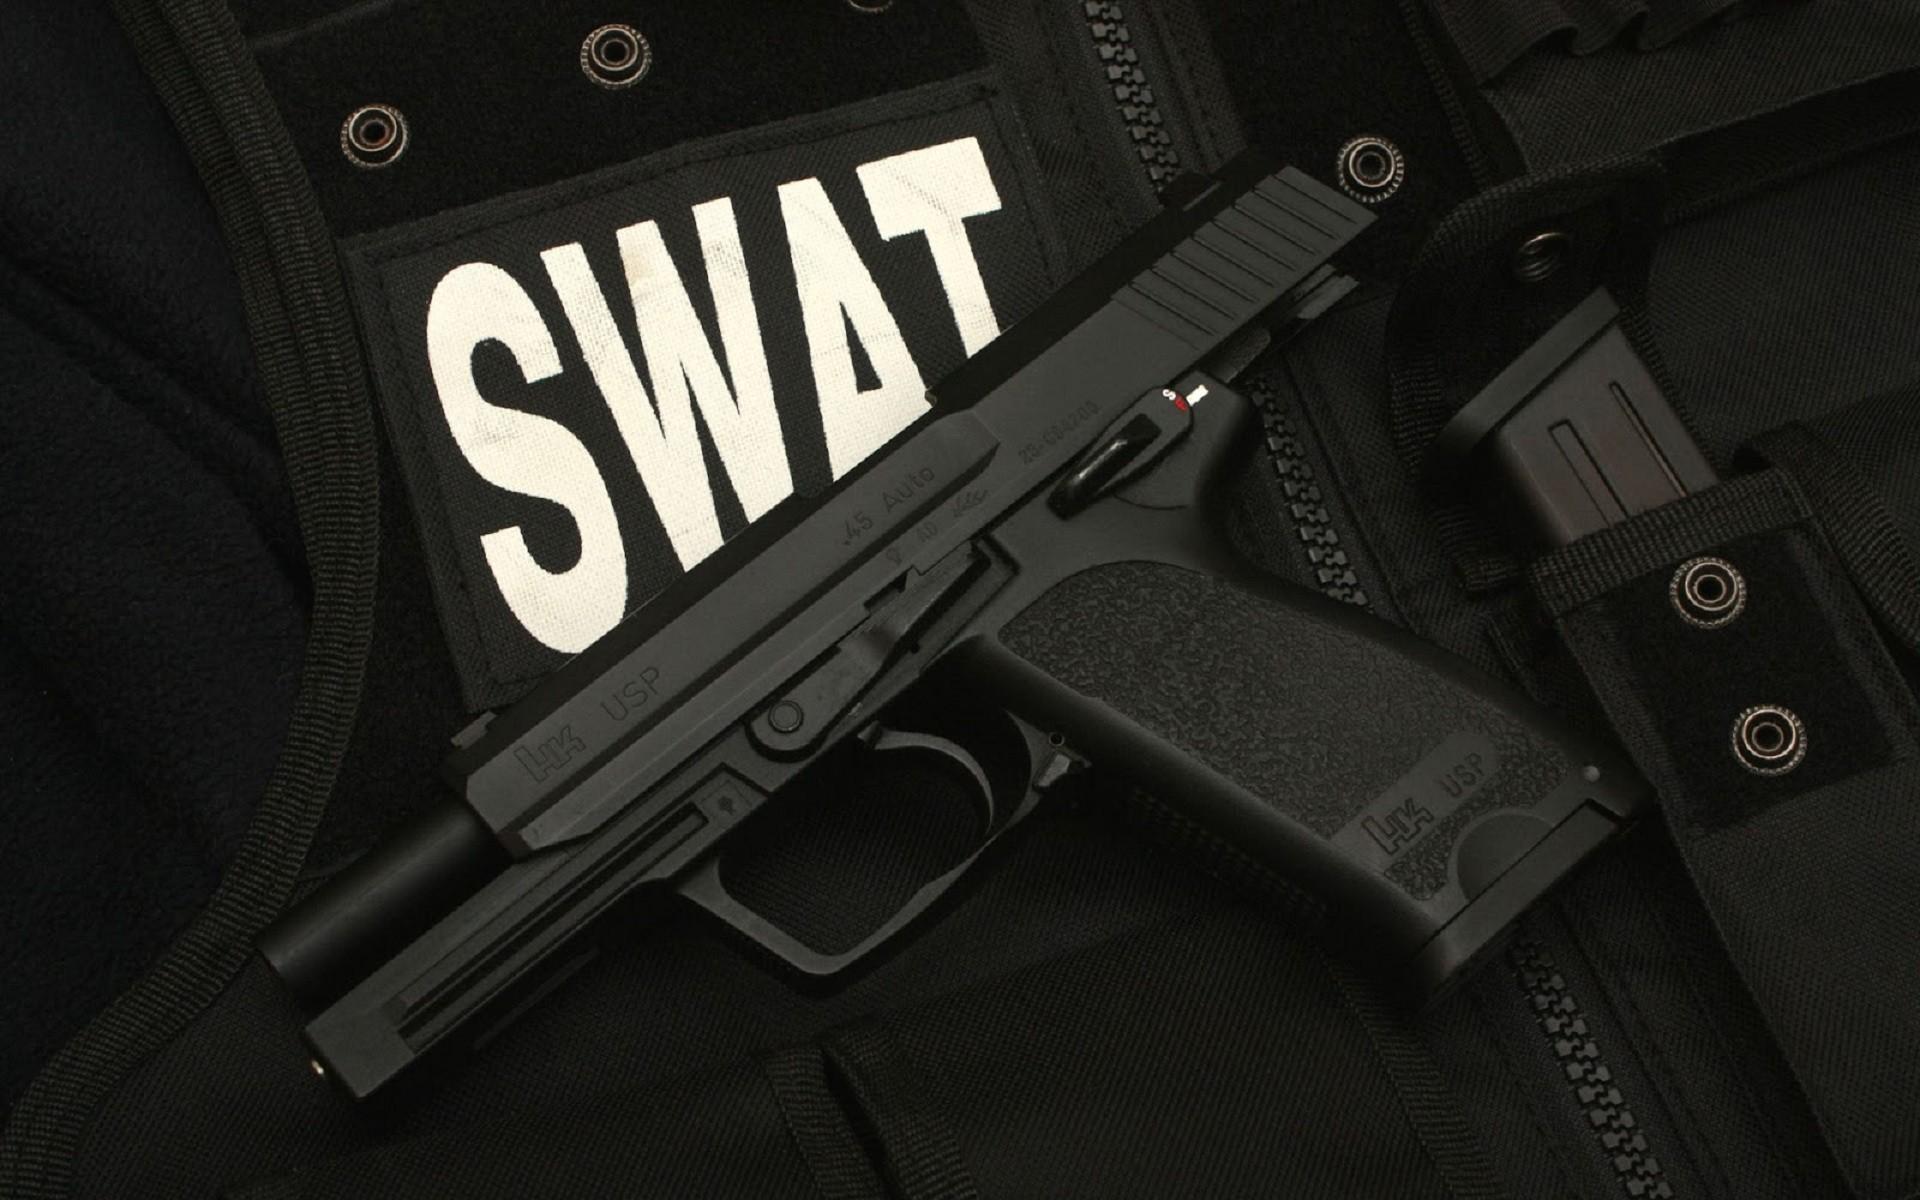 Swat Car Wallpaper 2560x1600 Cool Guns Wallpaper 56 Images